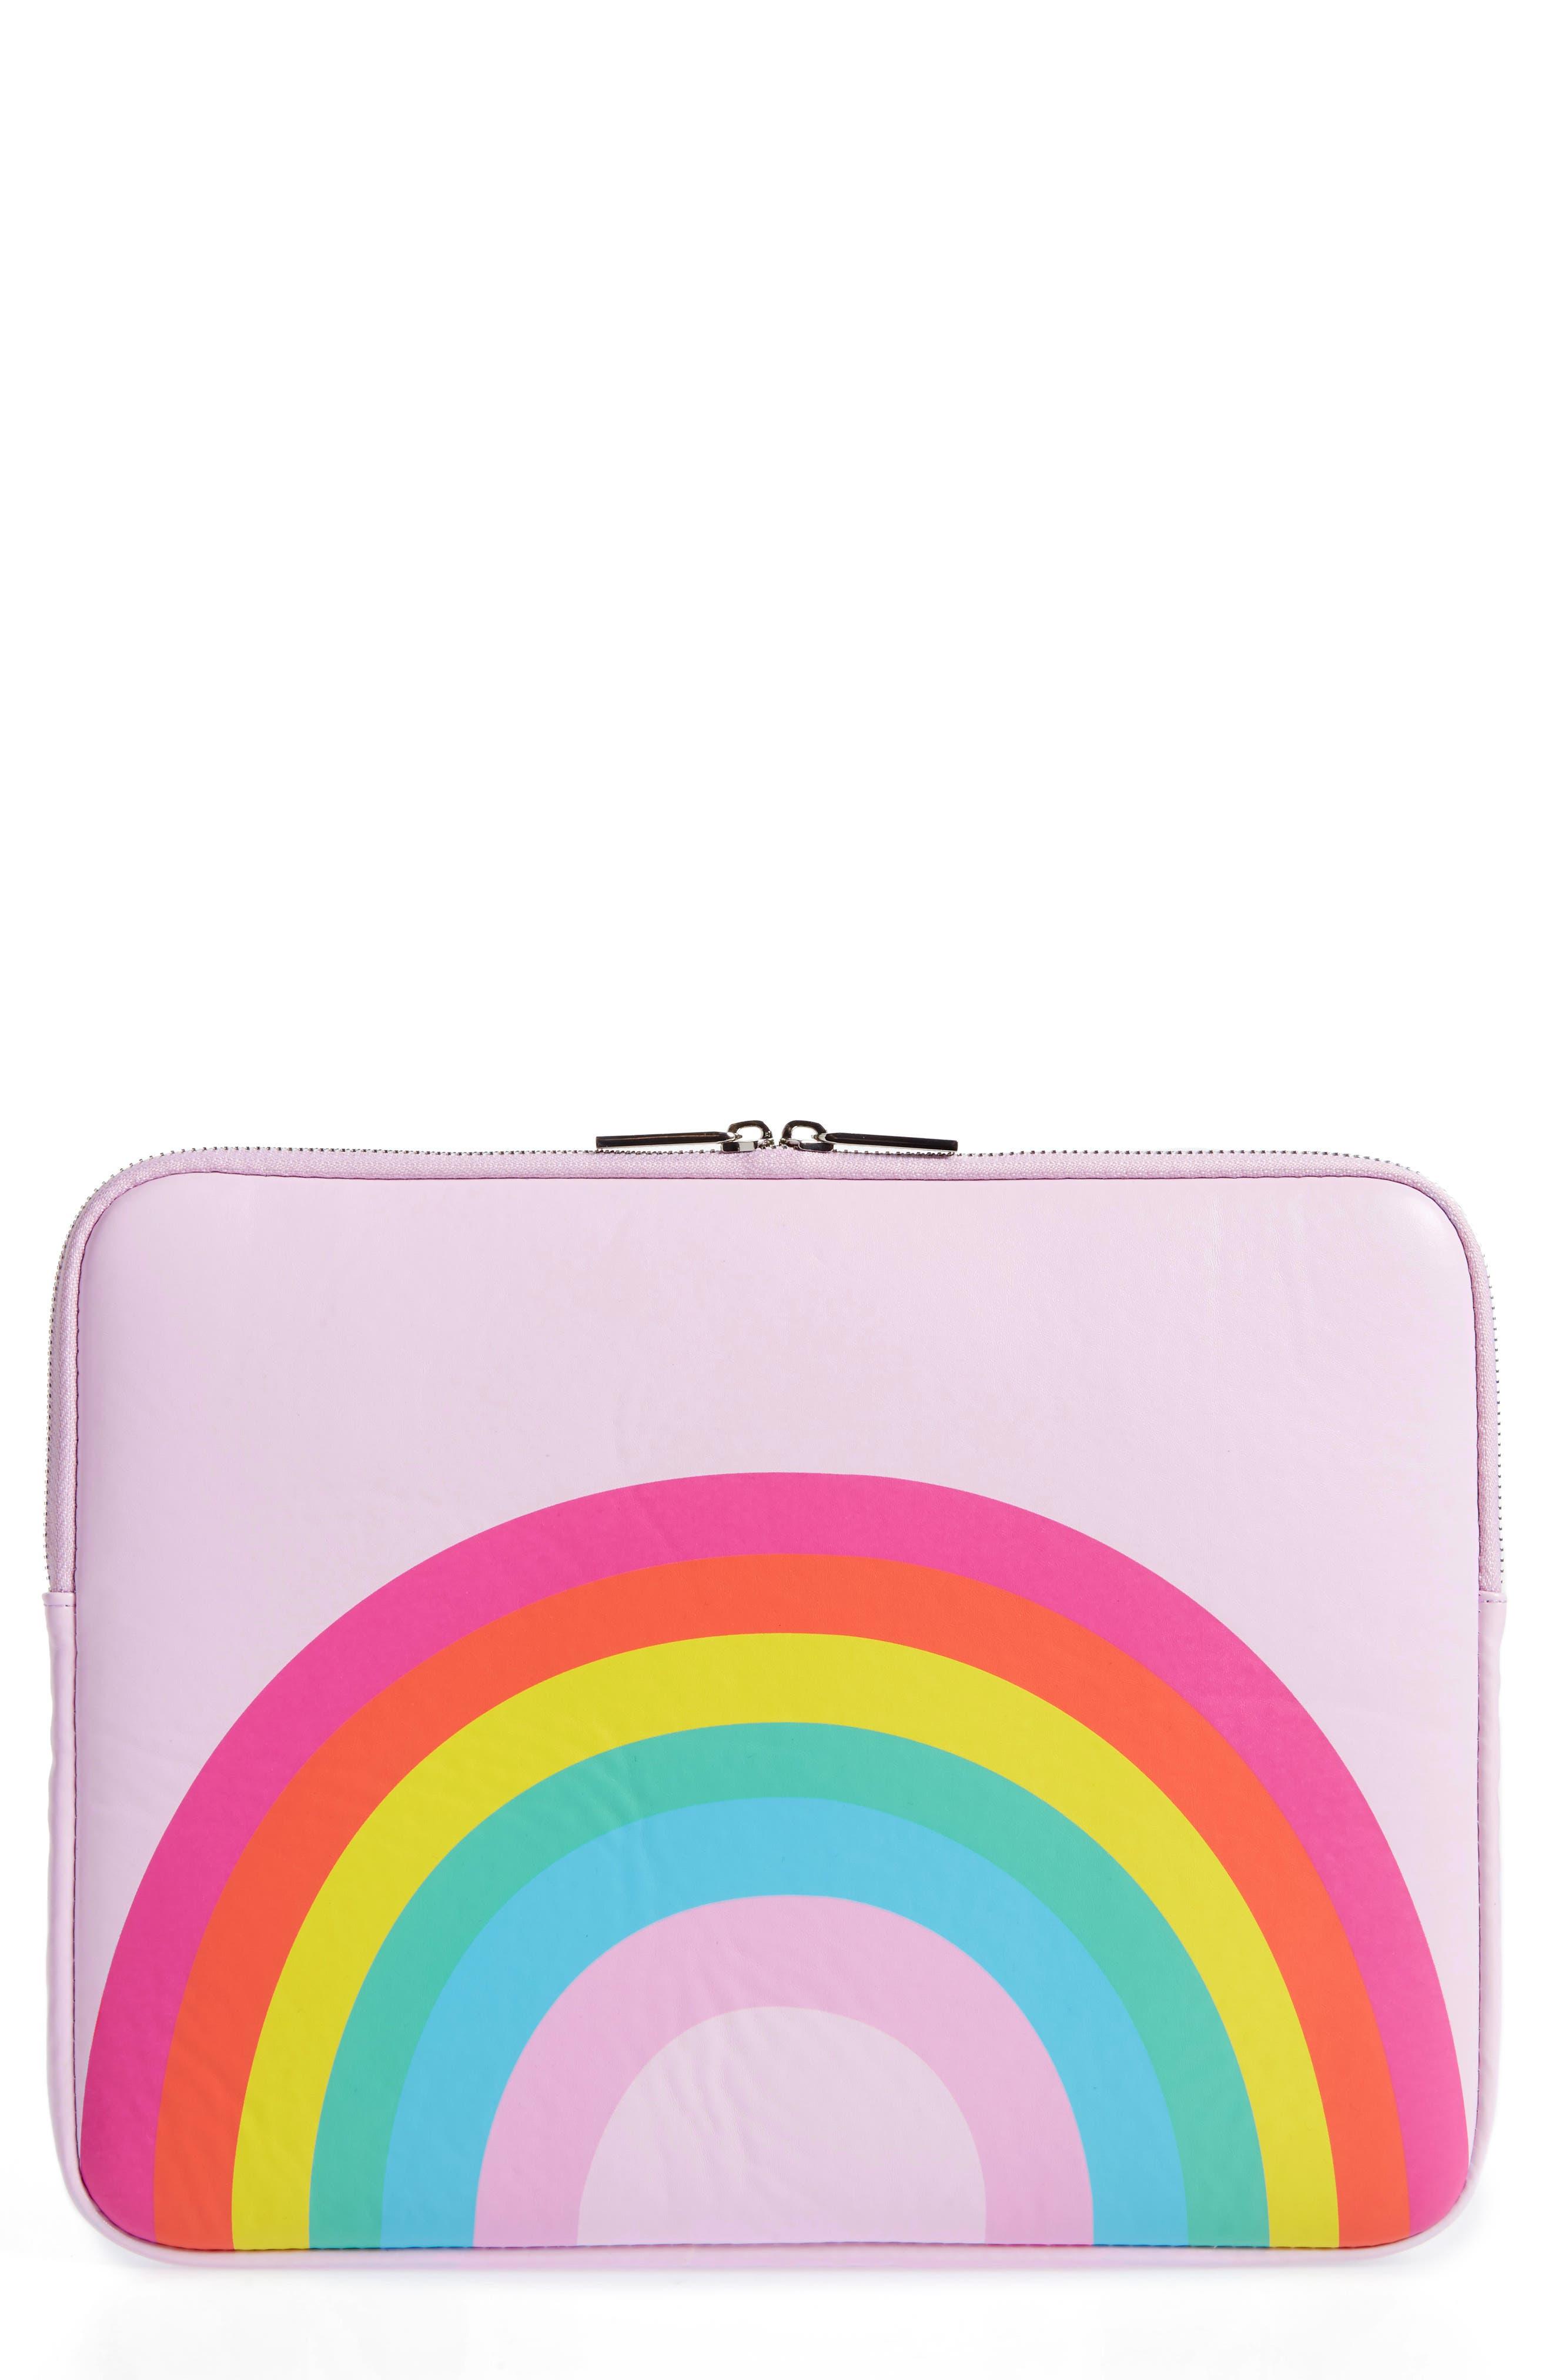 Skinny Dip Over the Rainbow 13-Inch Laptop Sleeve